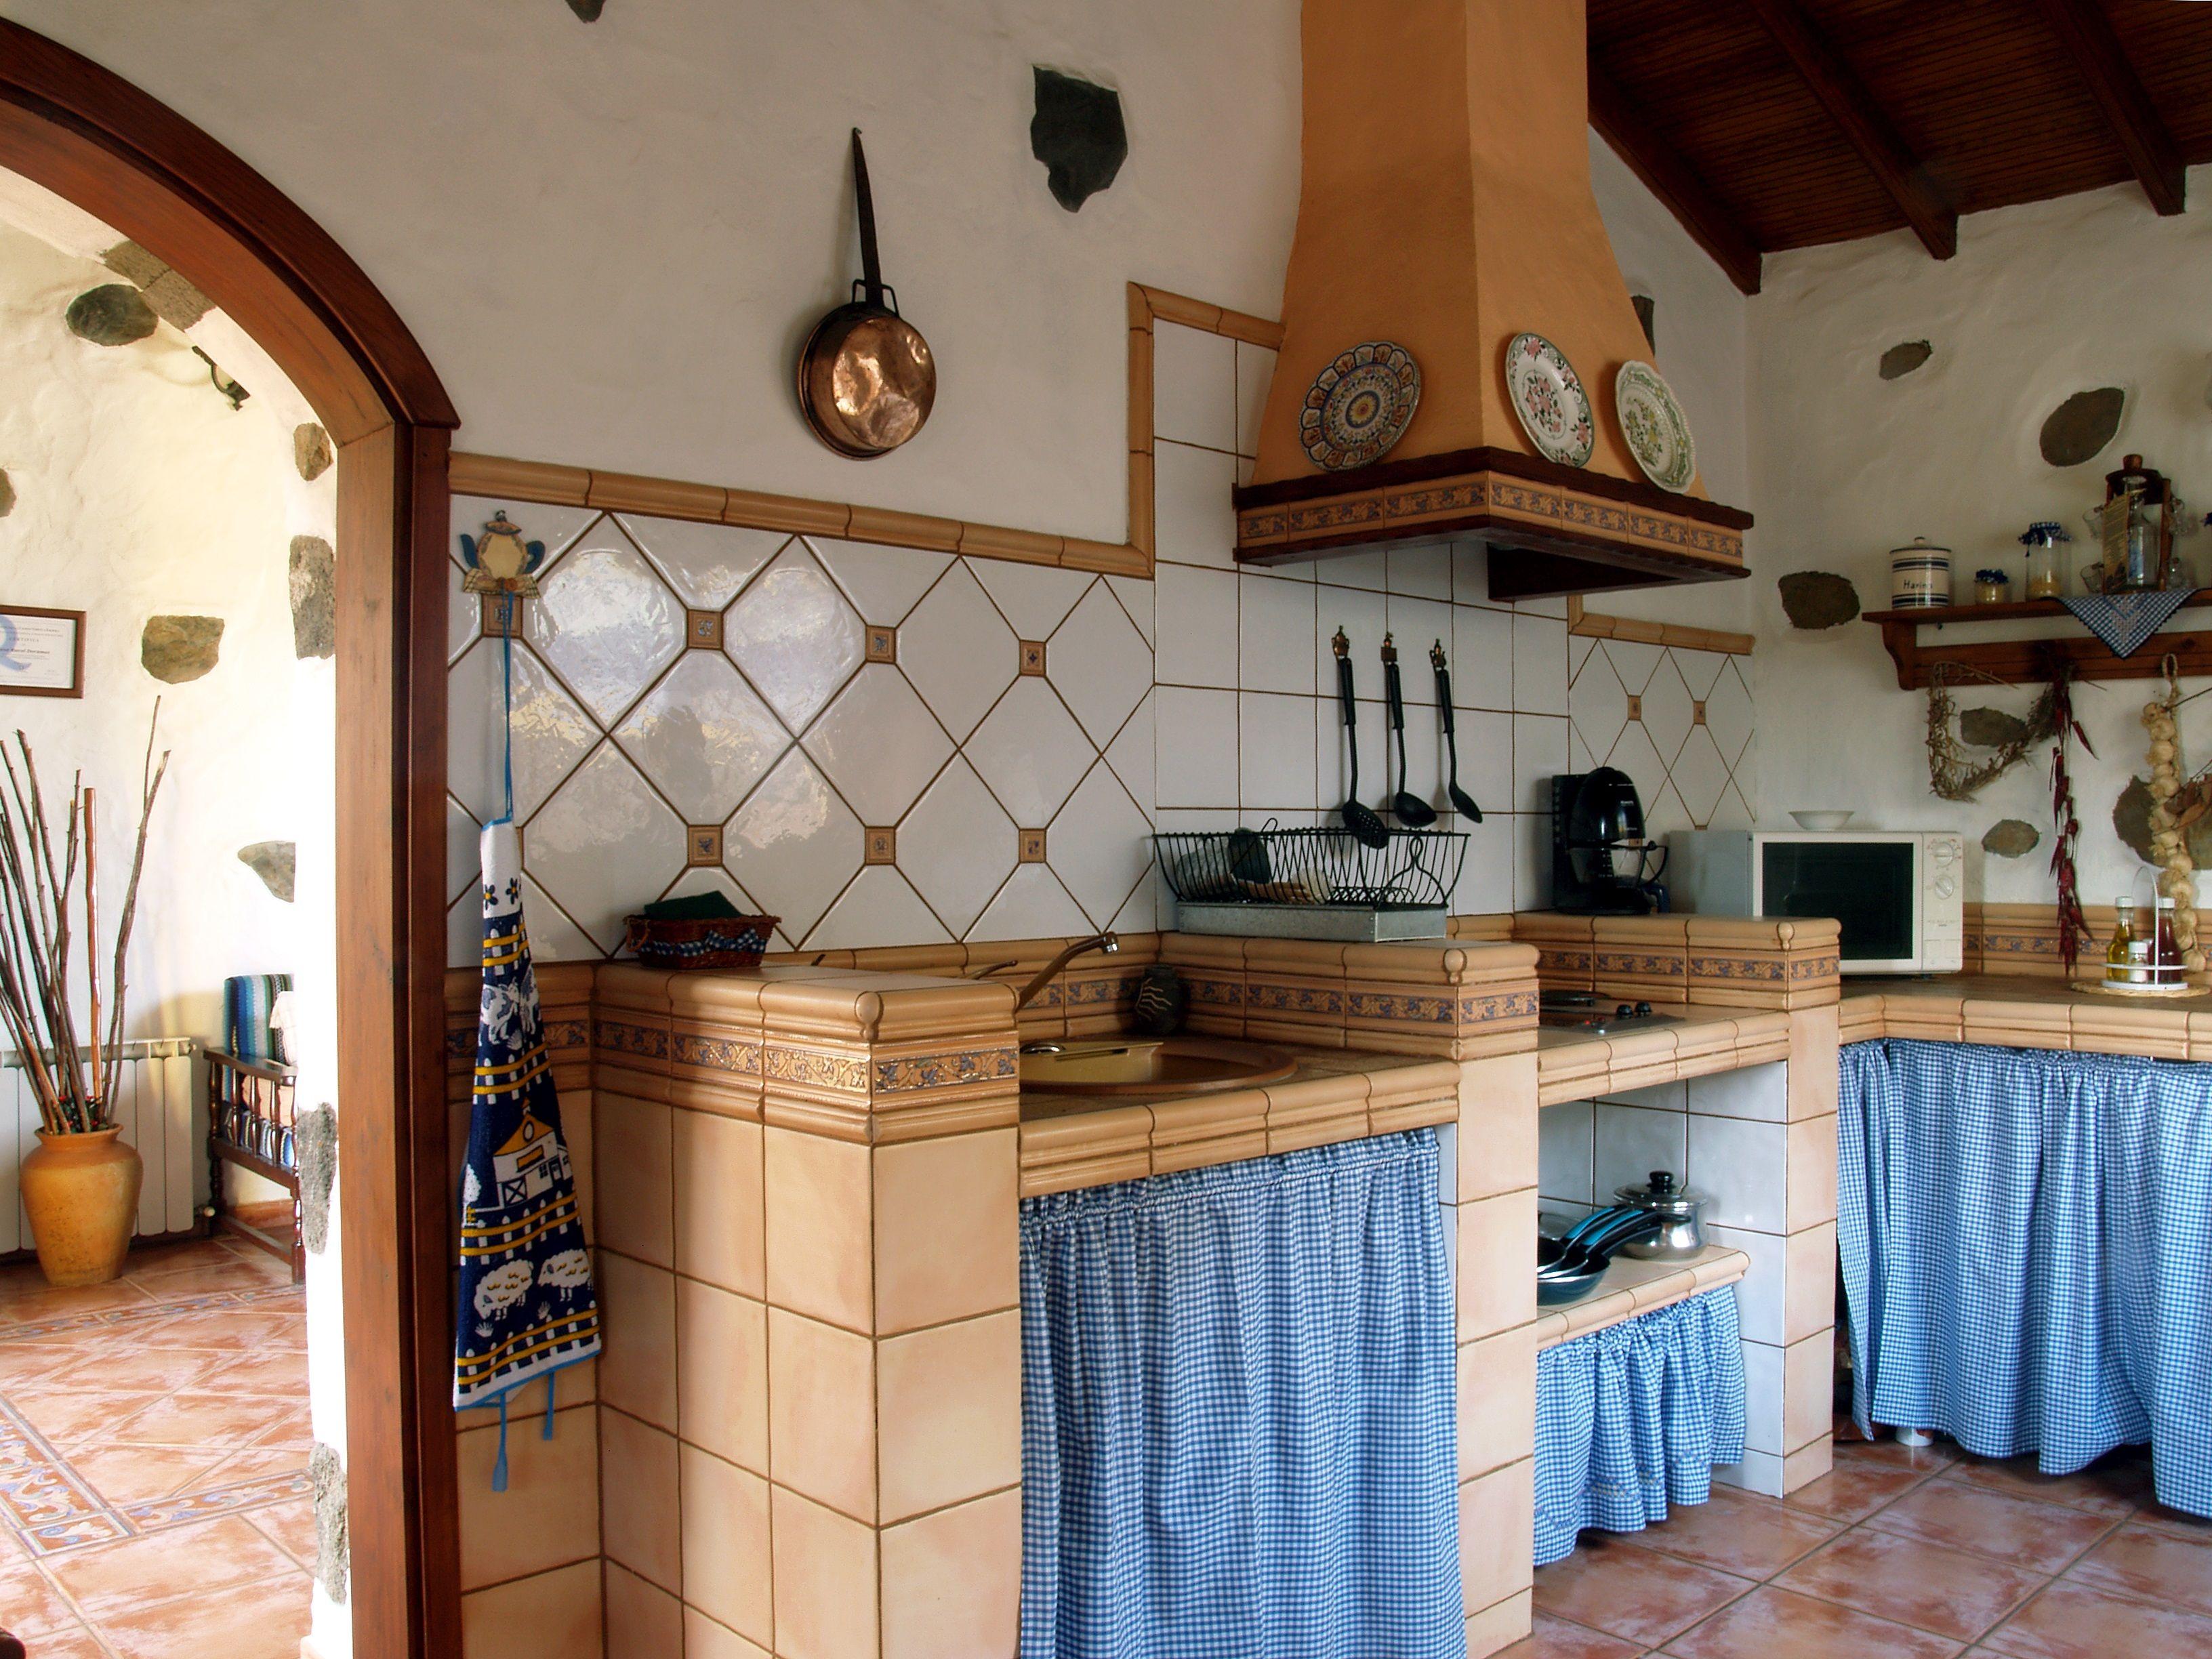 Cocina casa rural doramas pinterest cocinas cocinas - Fotos de cocinas rusticas de campo ...